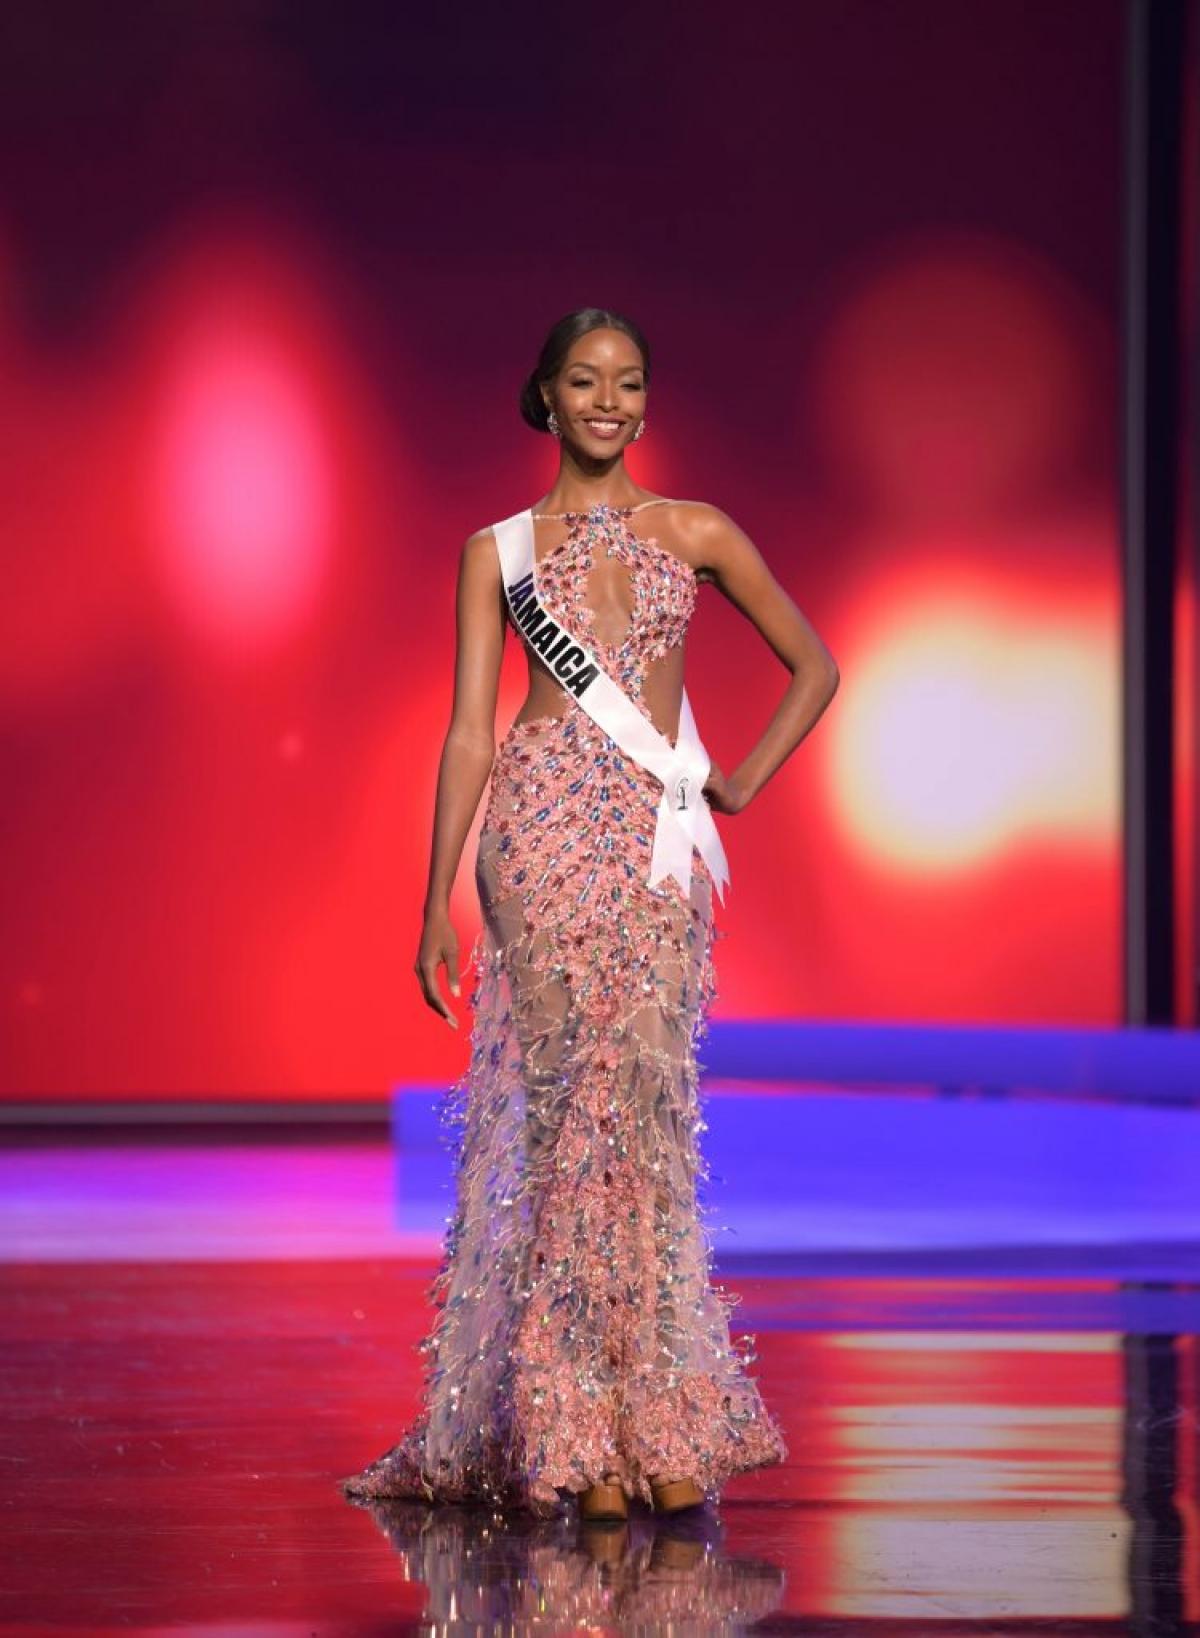 Hoa hậu Jamaica.